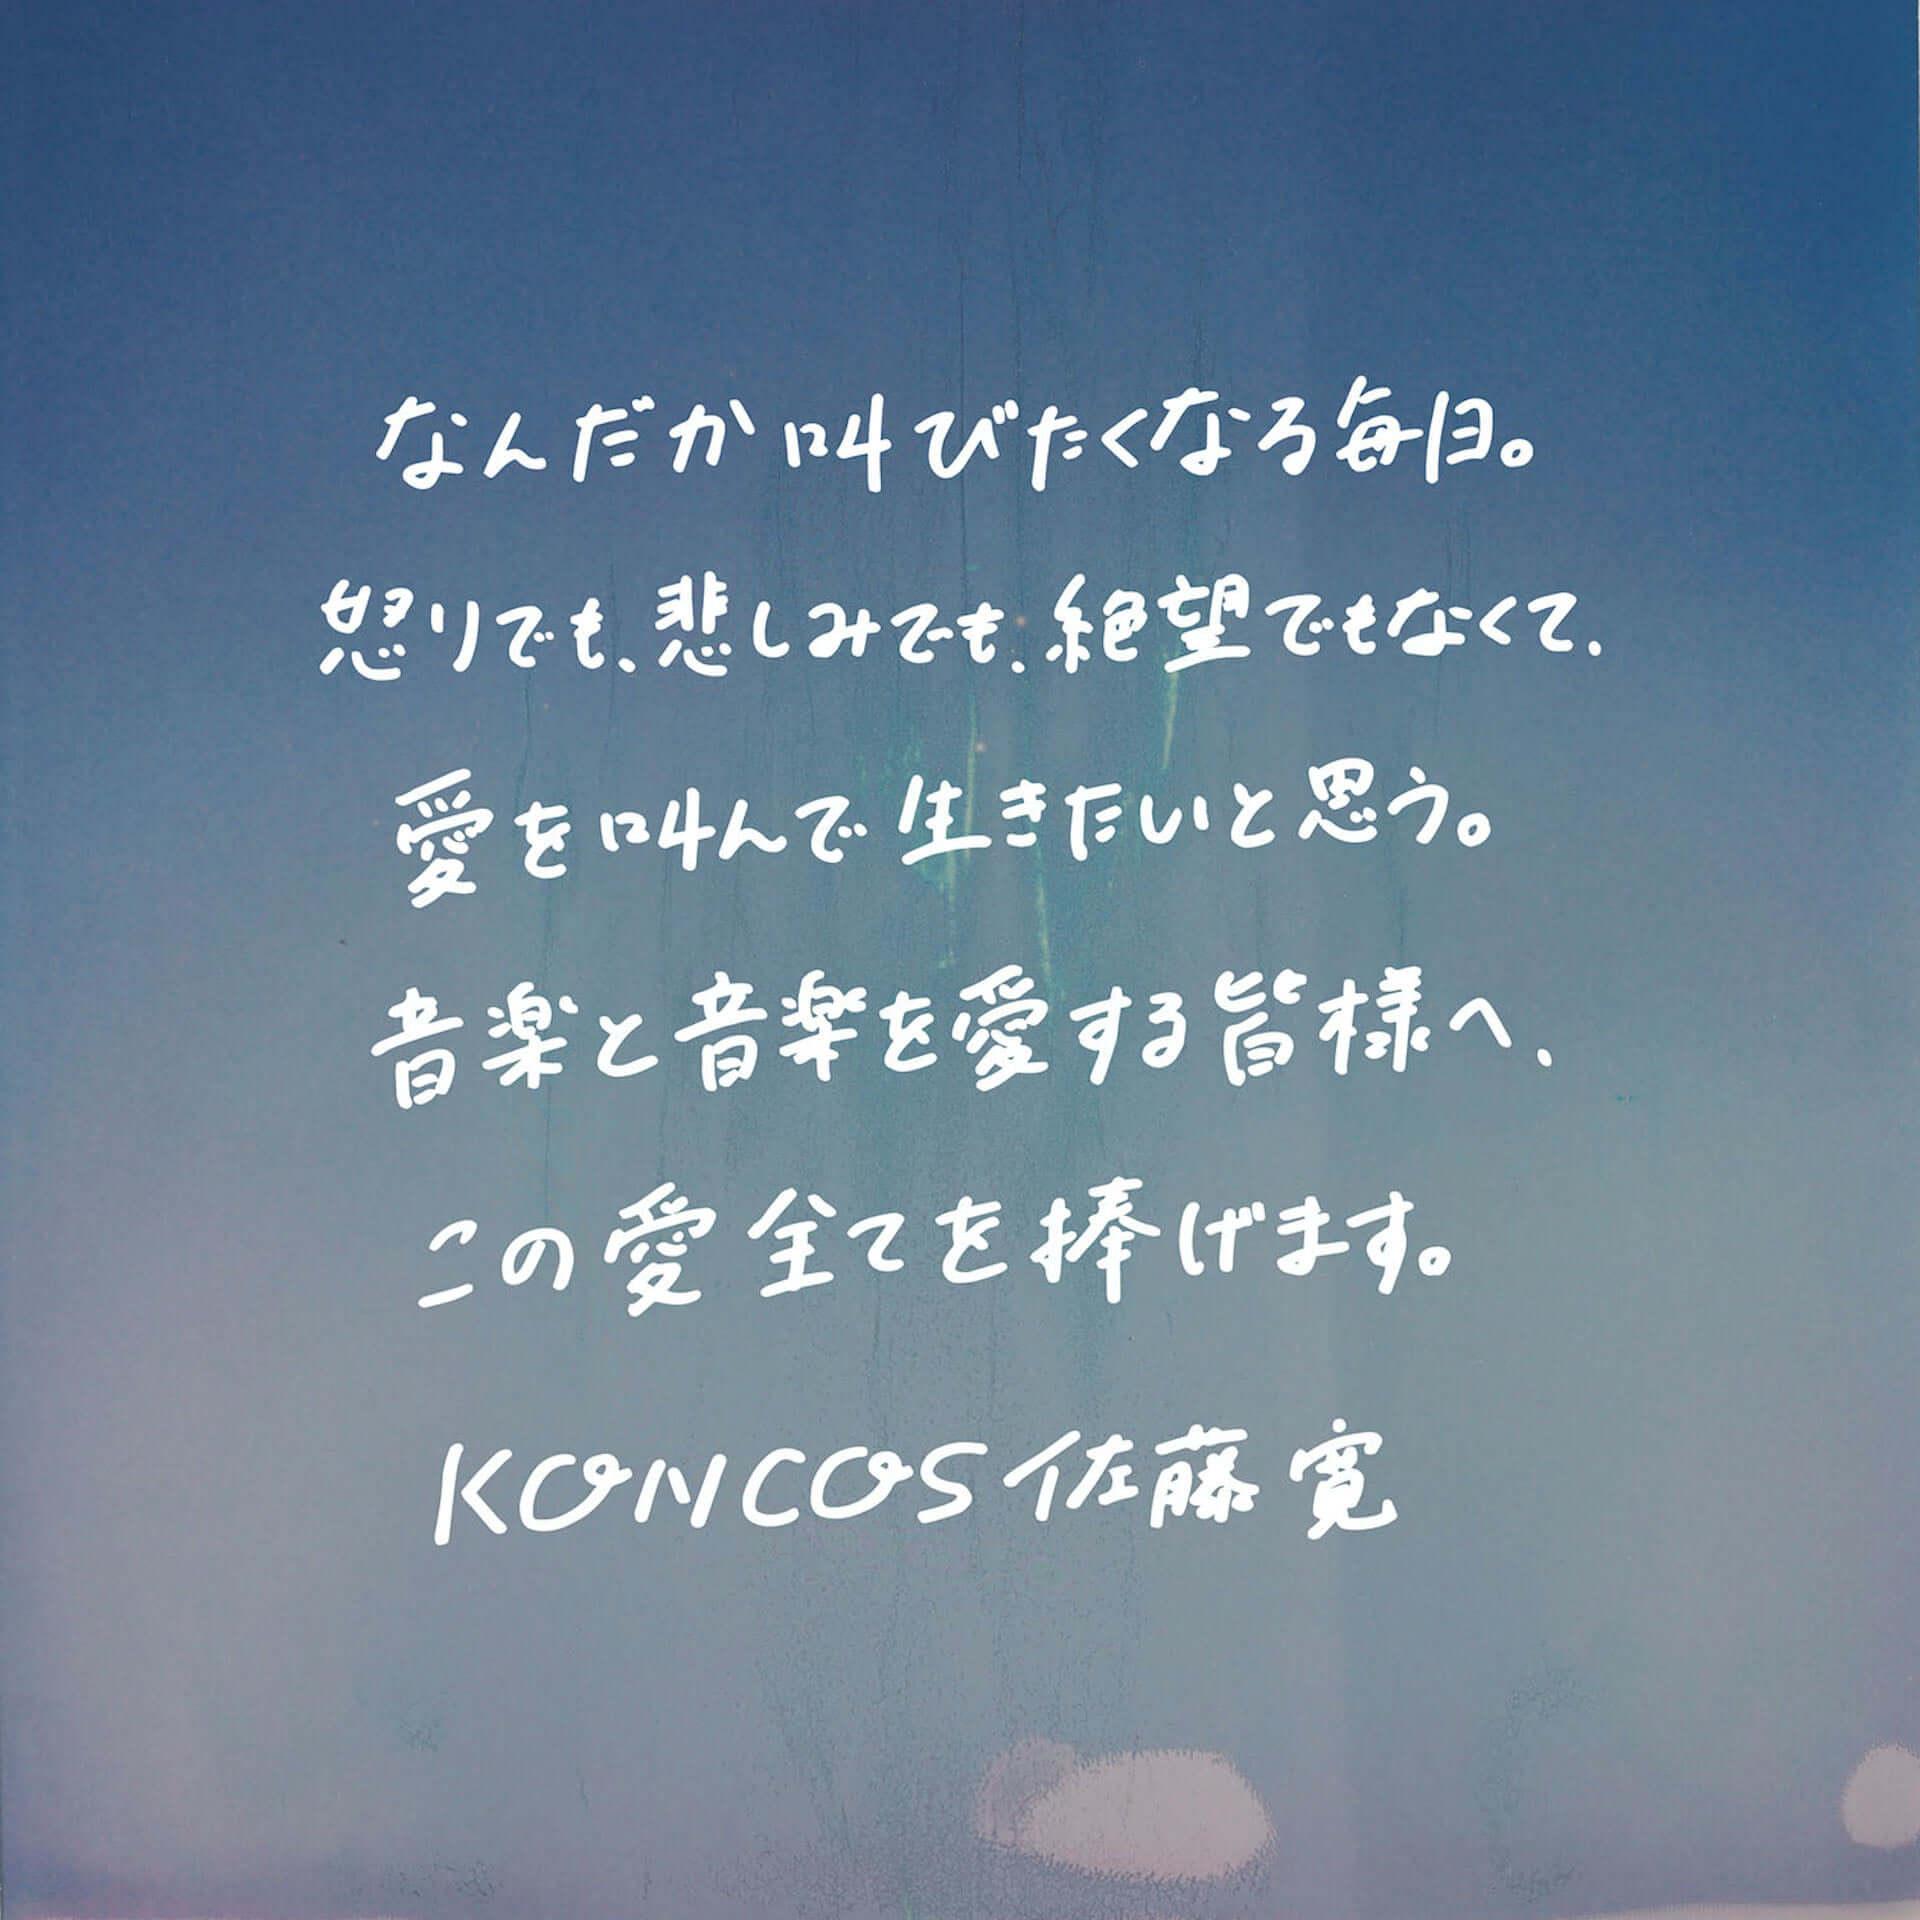 KONCOSの最新アルバムから新曲が連続配信決定|「SaveOurSpace」へのメッセージを込めたMVと共に第1弾が公開 music200520_koncos_release_1-1920x1920